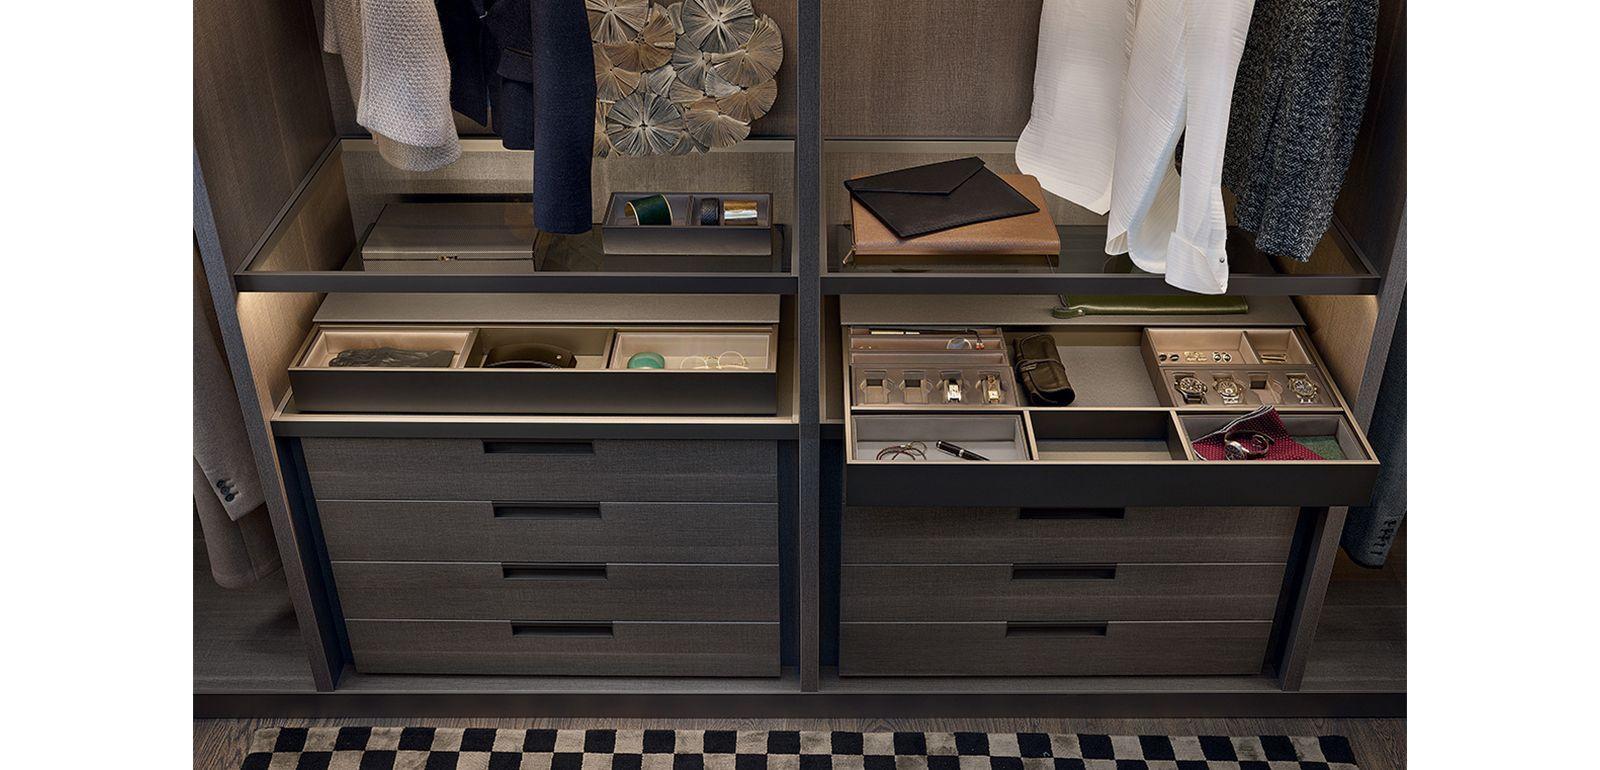 dressing poliform sur mesure am nagement dressing sur mesure silvera. Black Bedroom Furniture Sets. Home Design Ideas